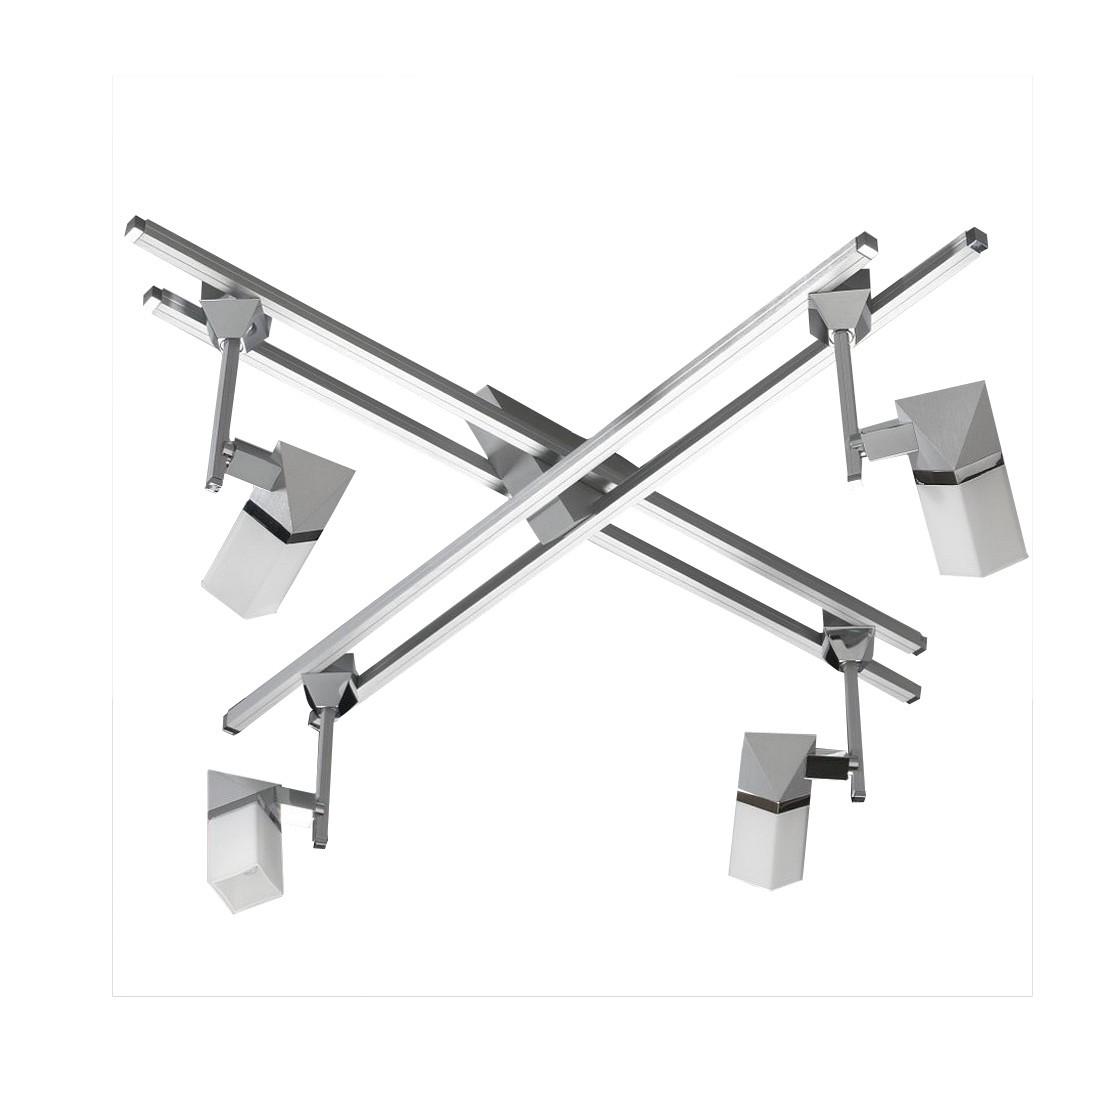 Deckenstrahler Alutop G II - 4-flammig, Aluminium-Chrom, In-Nova Design